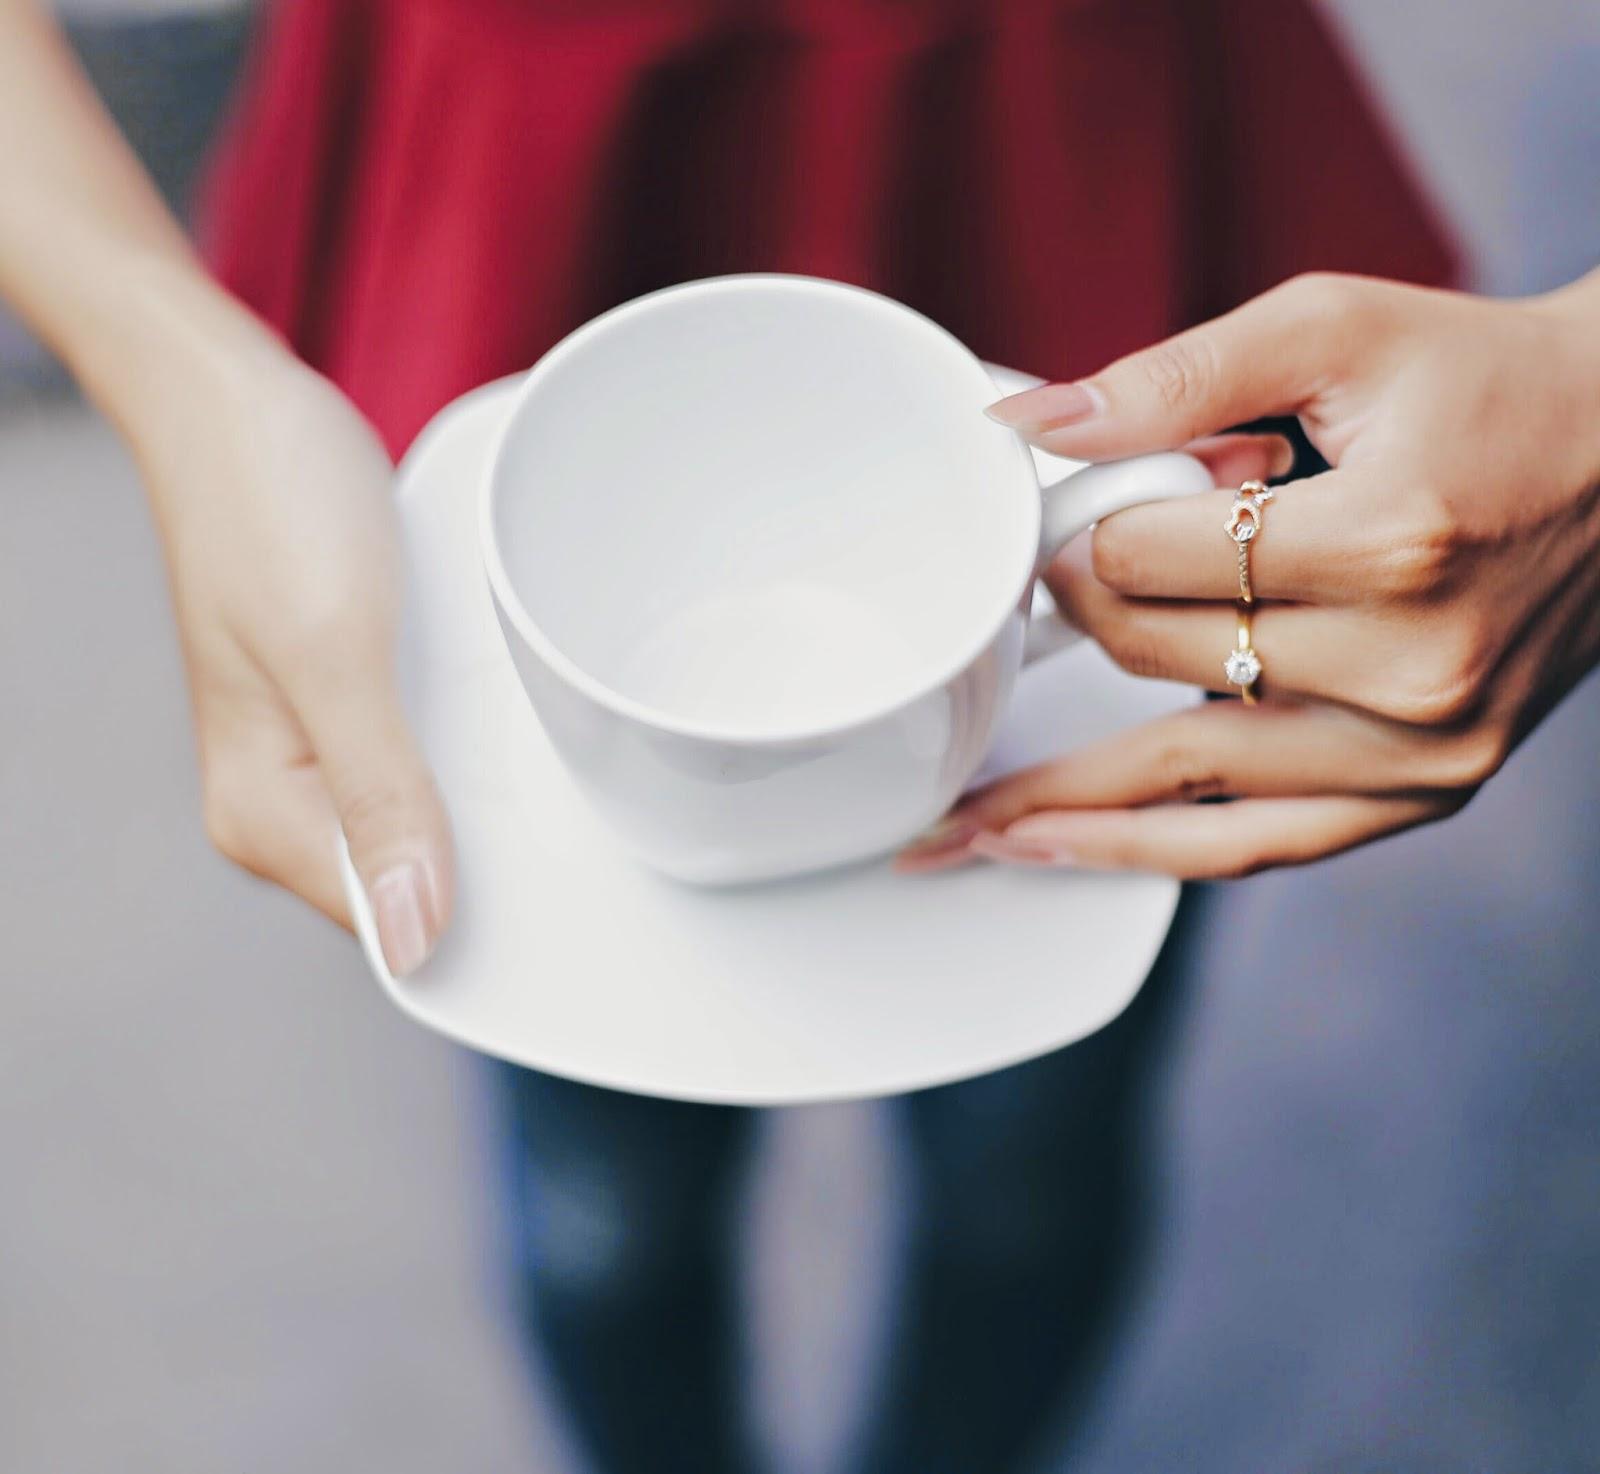 Проверка запаха изо рта с помощью чашки